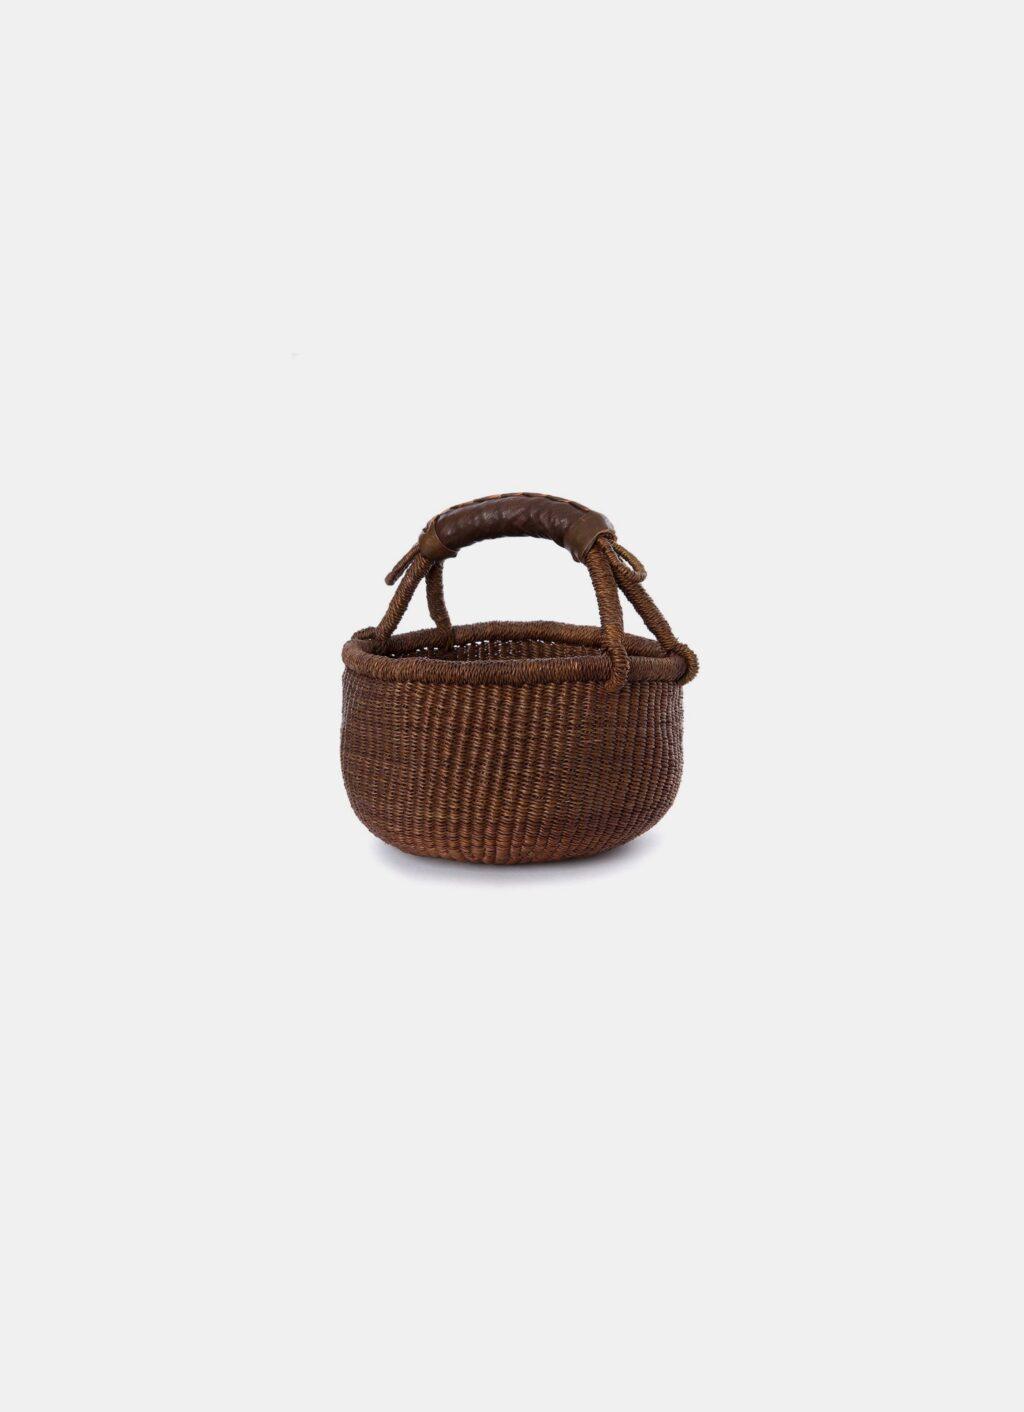 Handwoven African Basket - Mini Bolga basket - Dark brown